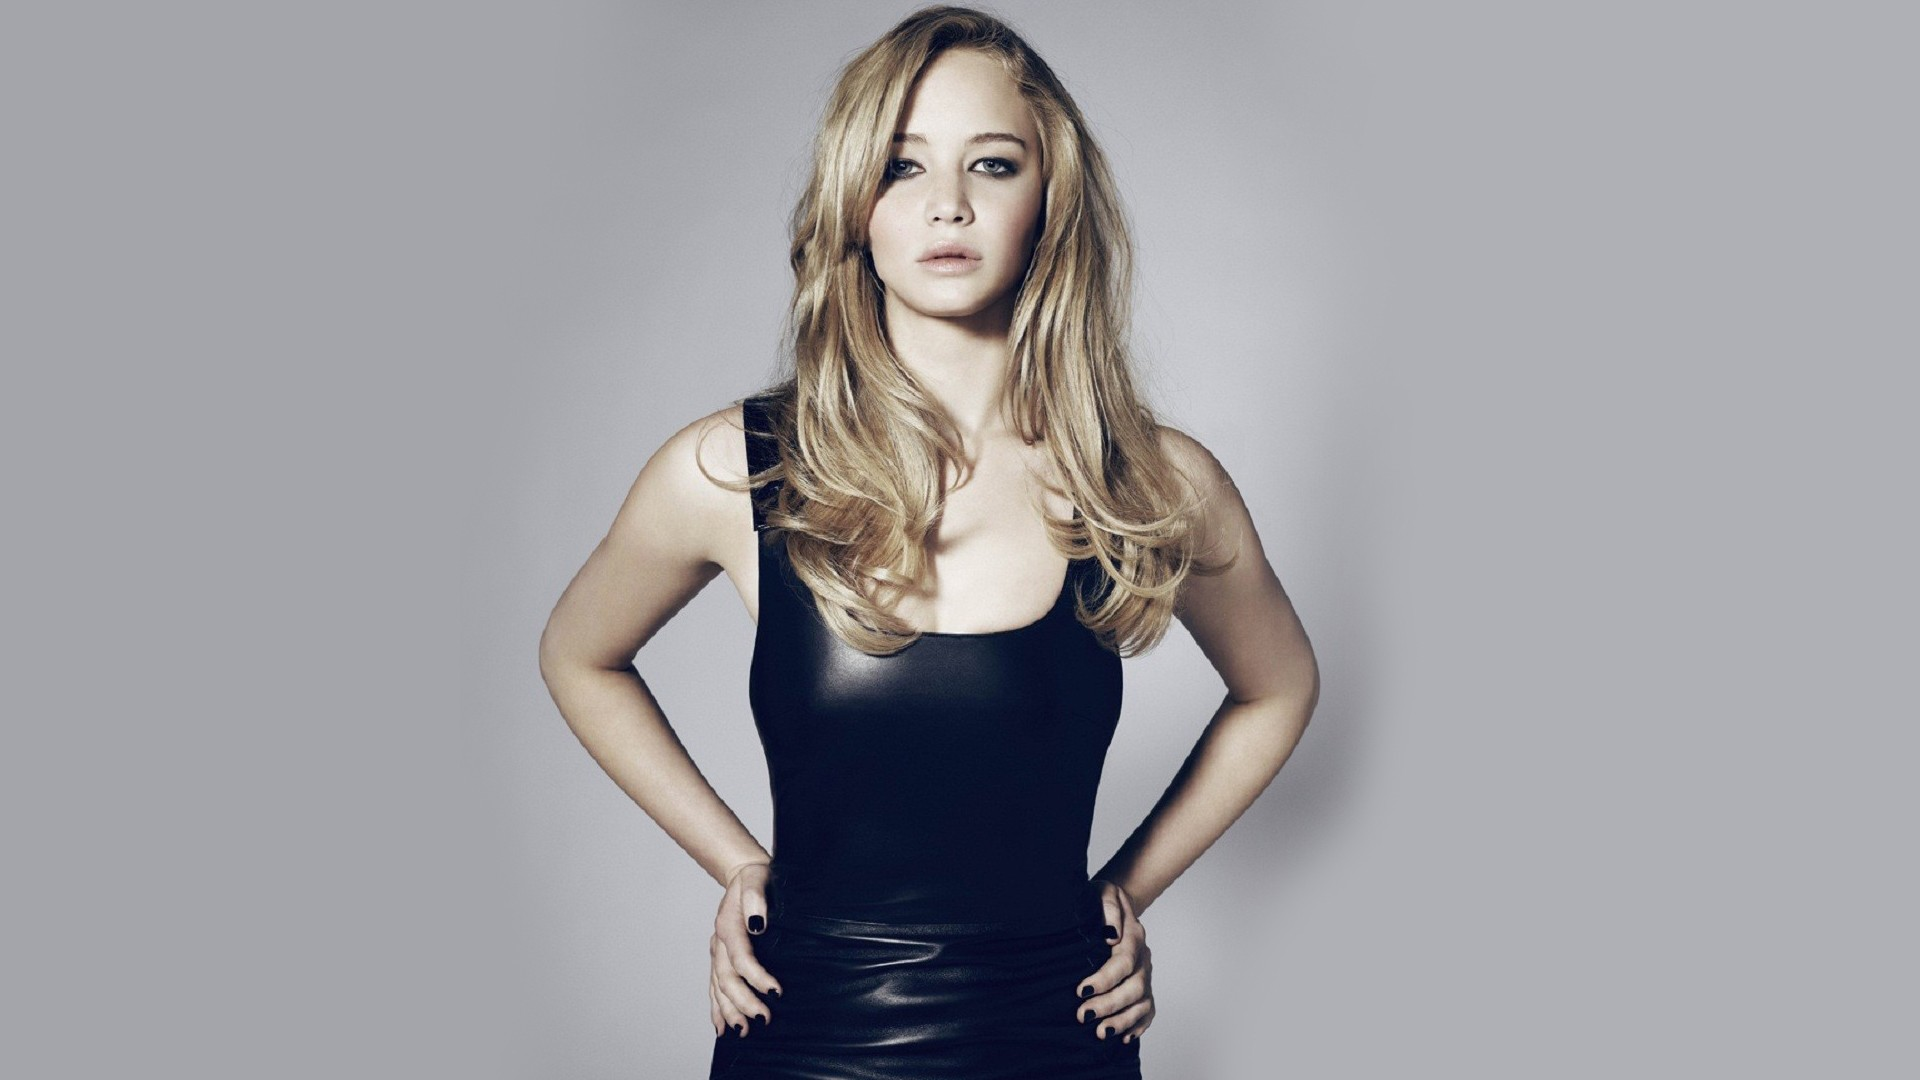 Jennifer Lawrence Background